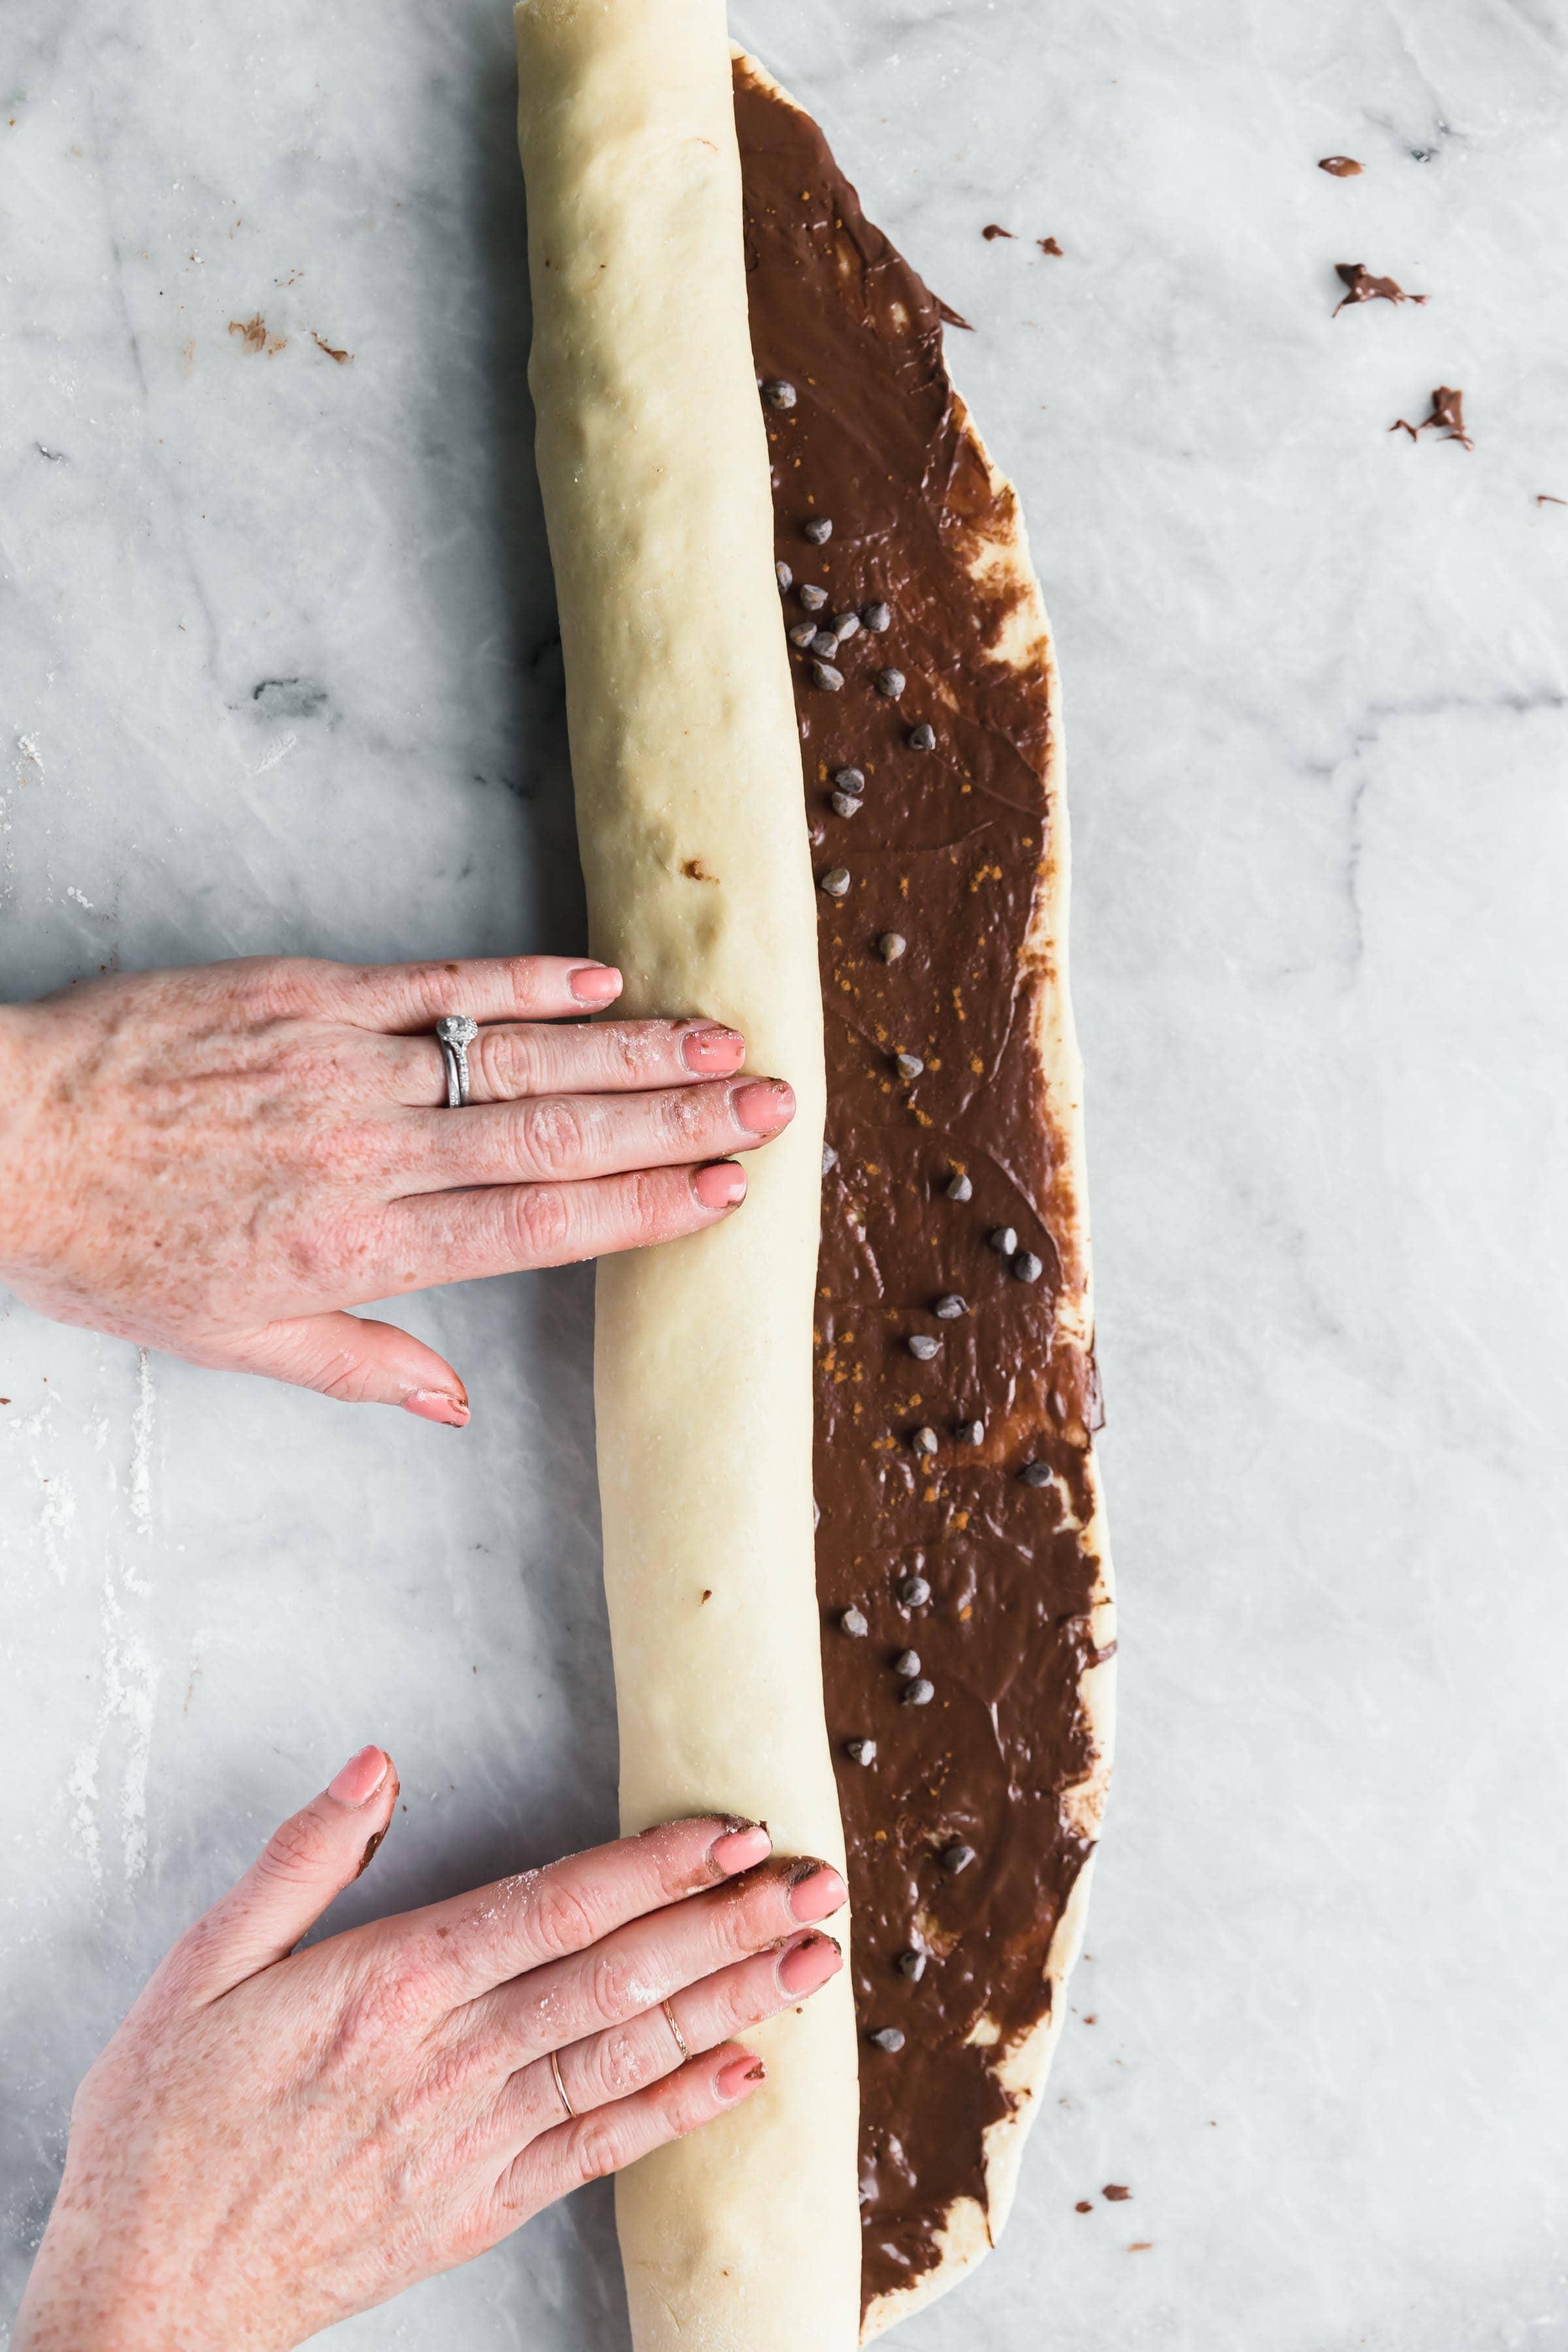 roll the cinnamon roll dough into a tight log